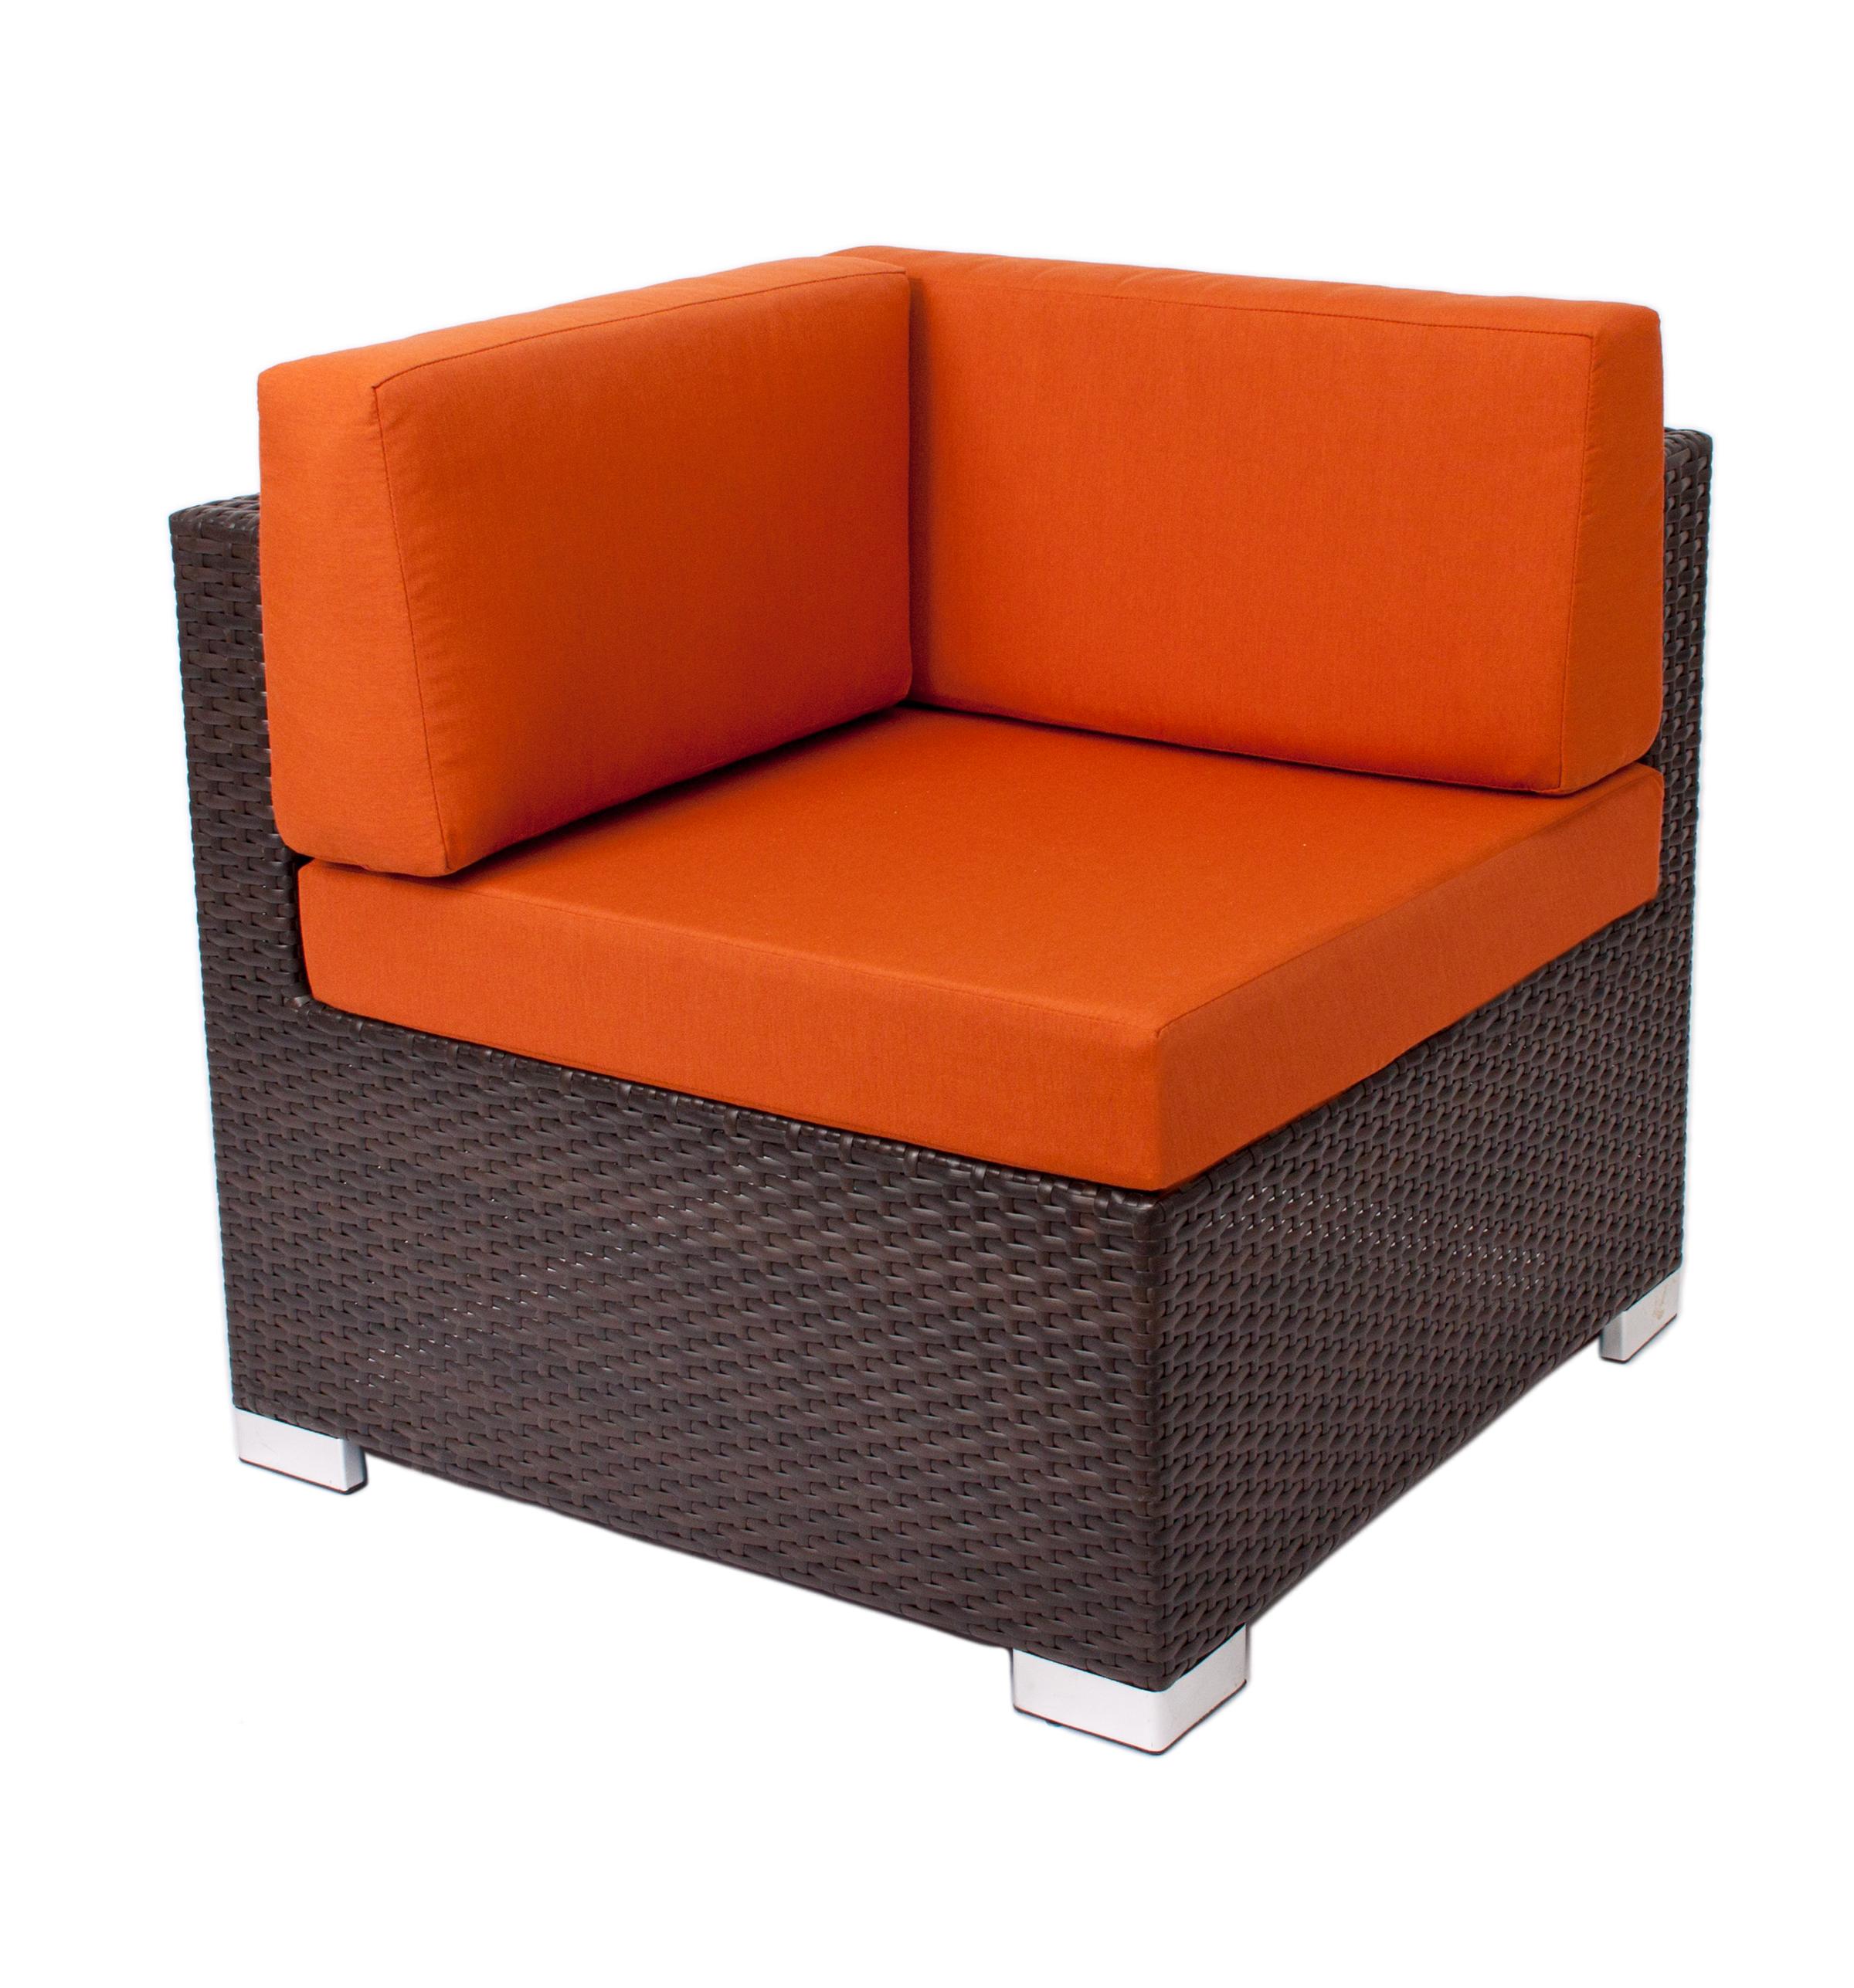 Cushions For Aruba Corner Sofa Section Millennium Seating